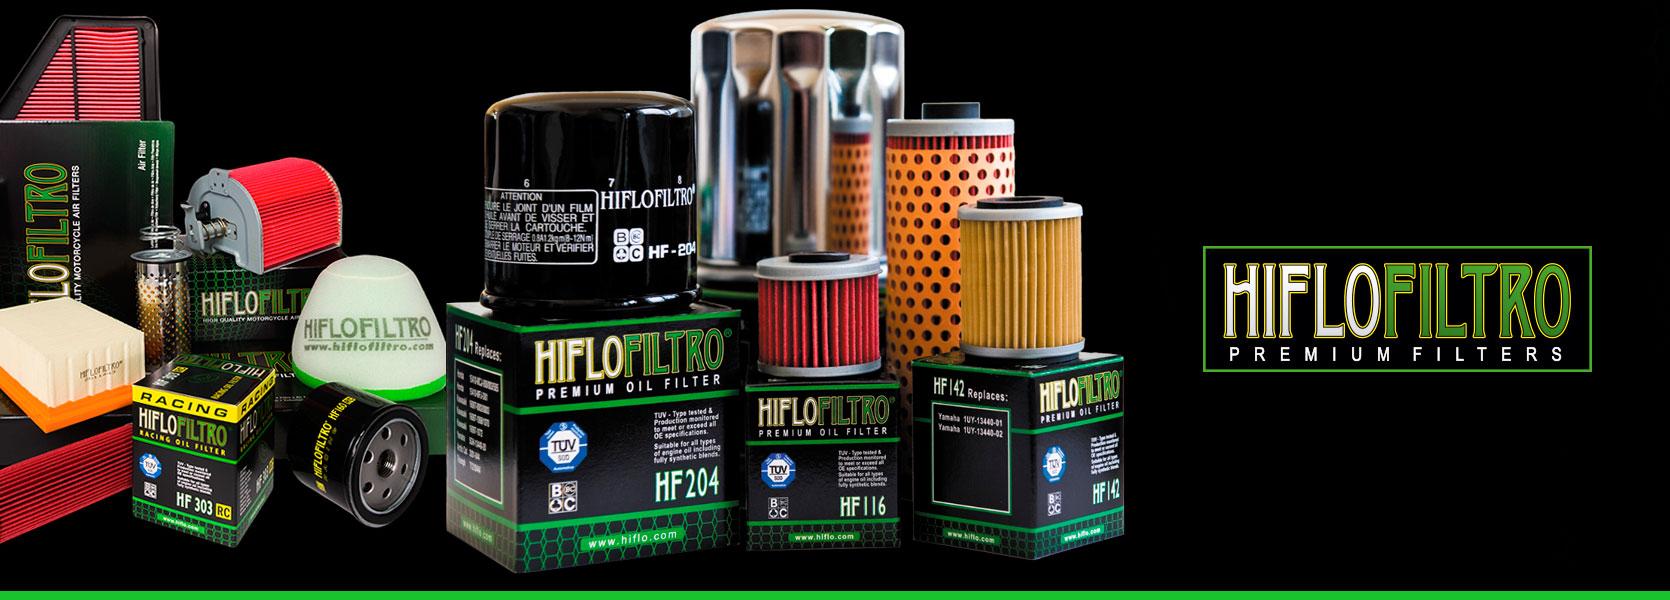 hiflofiltro_FULL.jpg